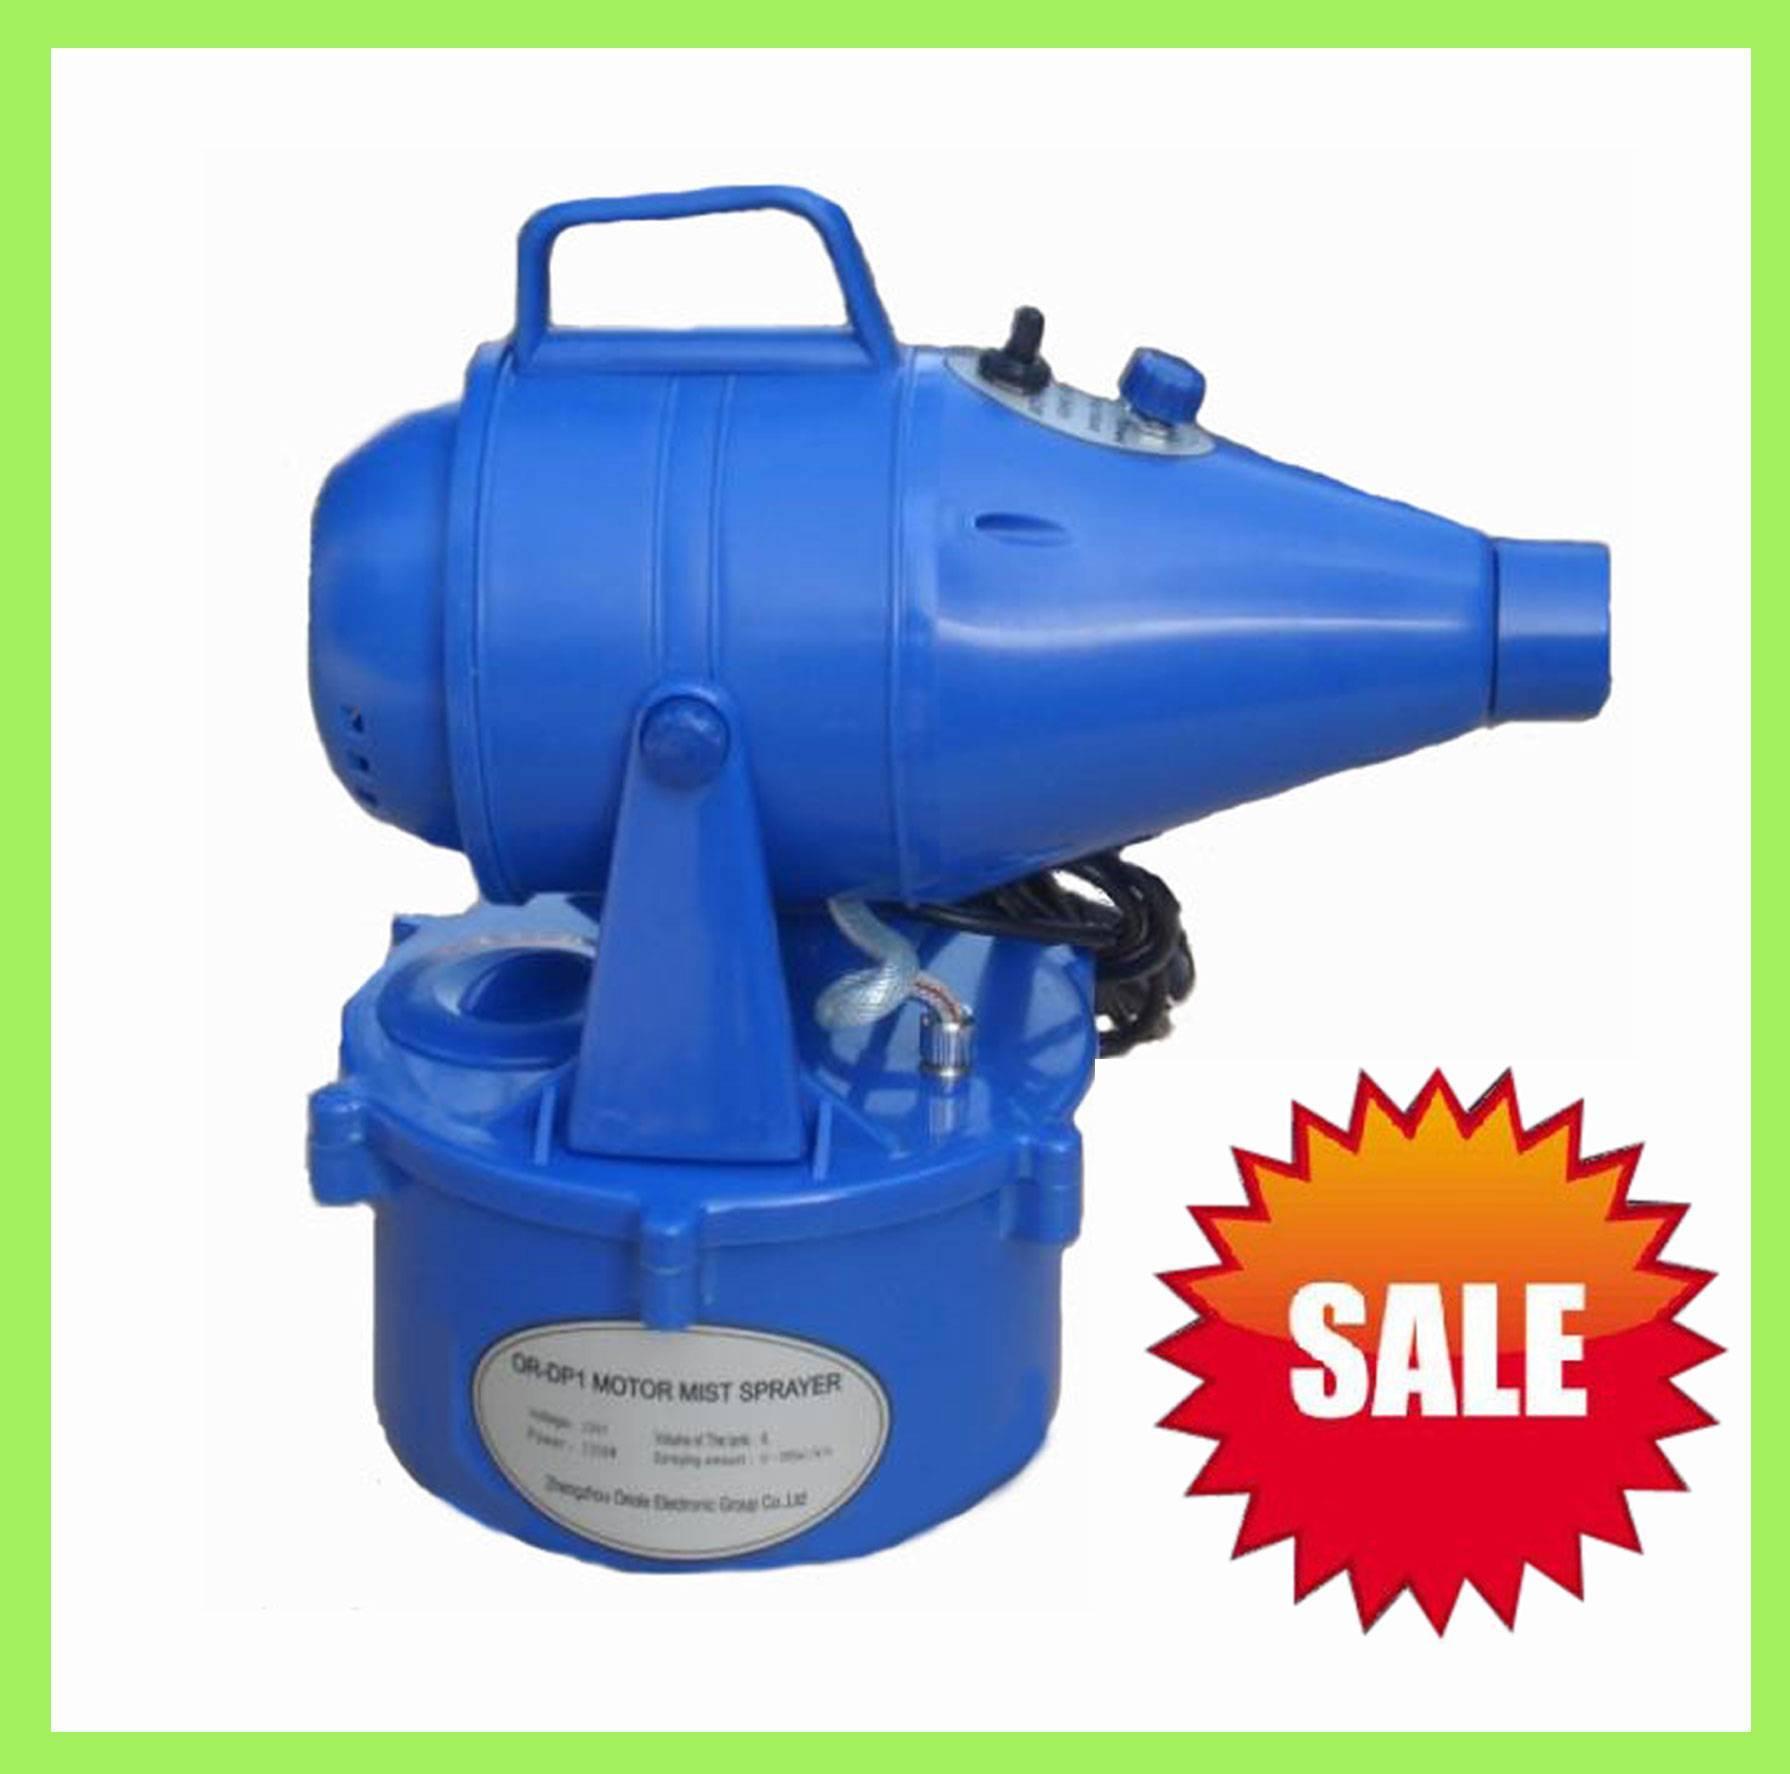 Ultra low volume sprayer for sterilization ,garden equipment